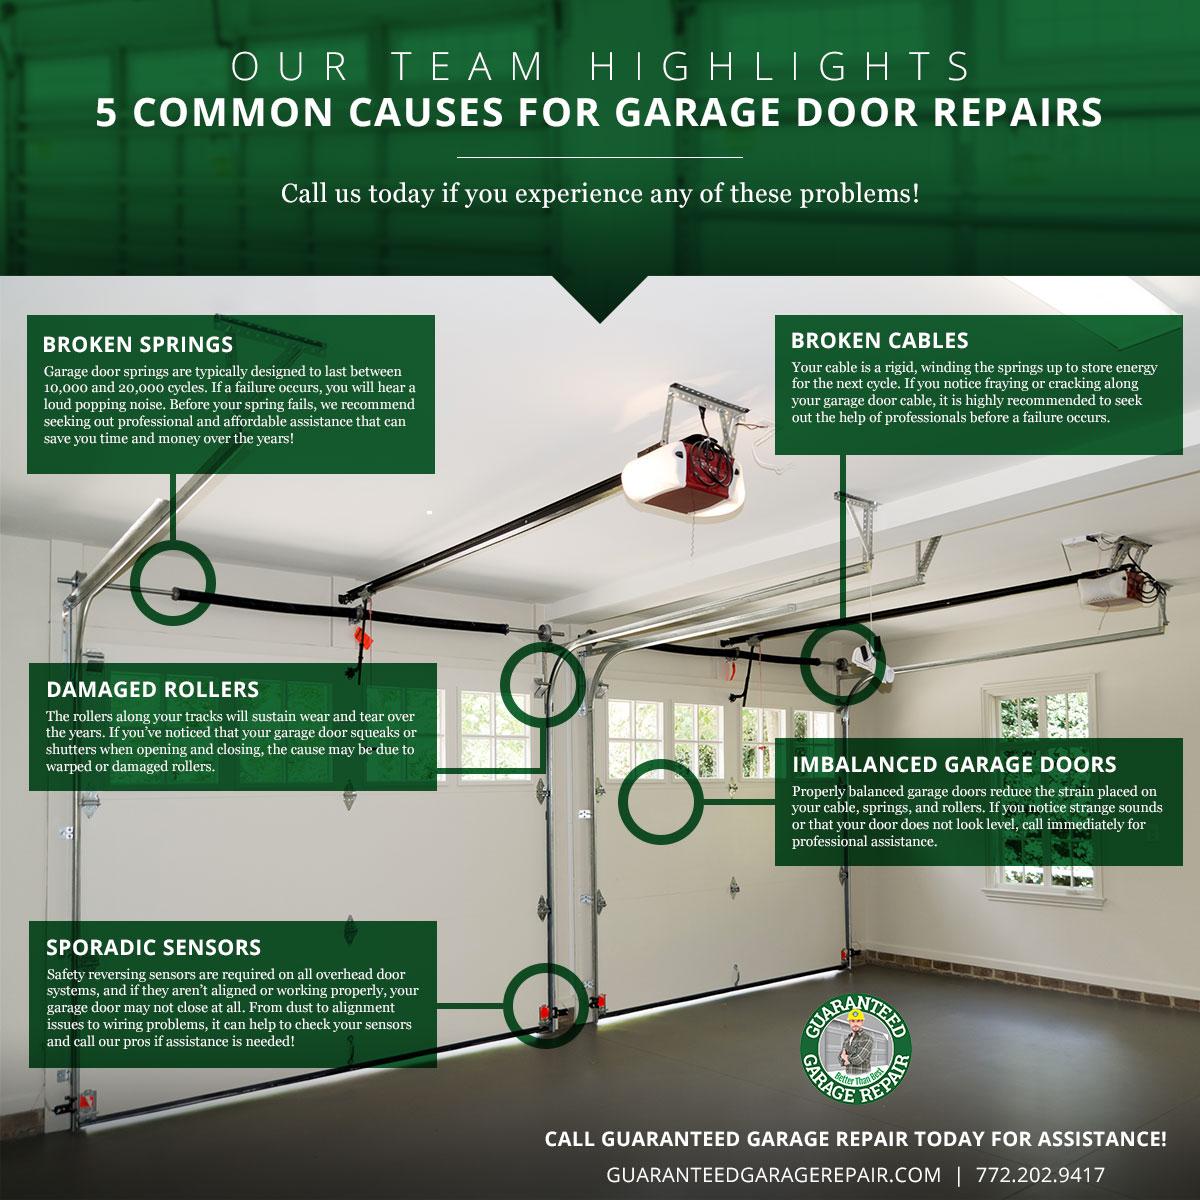 Garage Door Repair Stuart Our Team Highlights 5 Common Causes For Garage Door Repairs